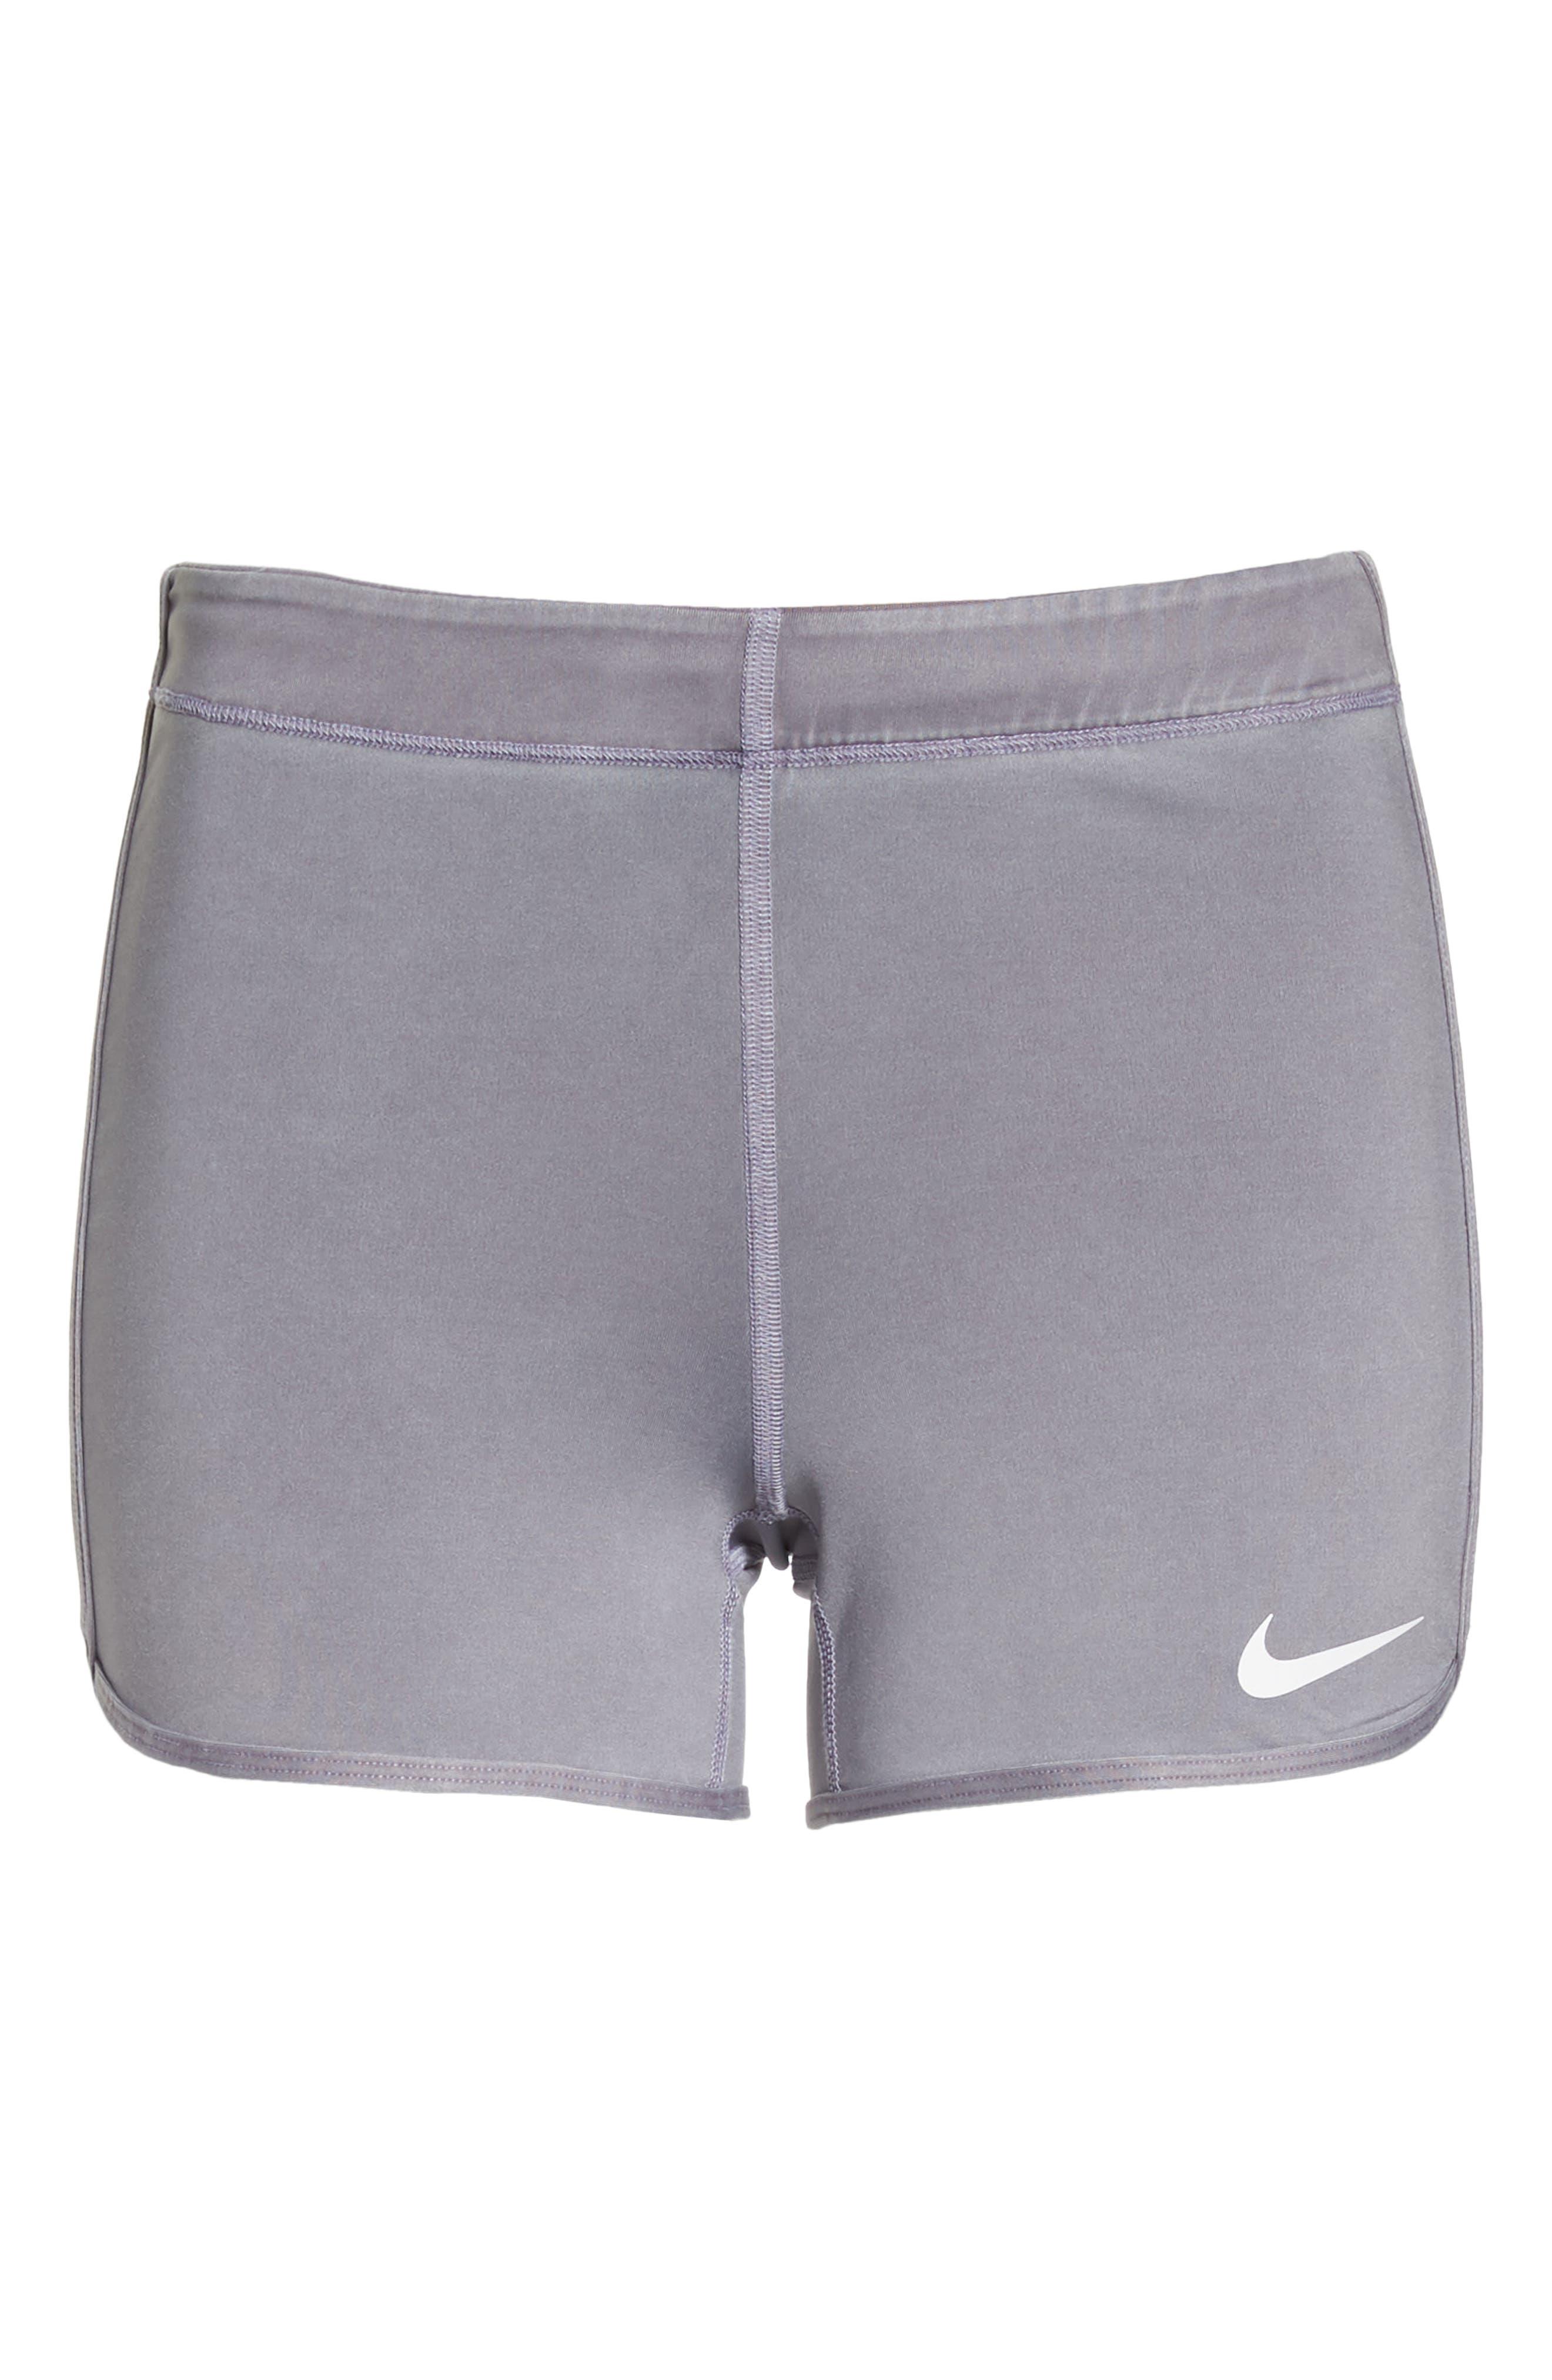 Pro Vintage Shorts,                             Alternate thumbnail 7, color,                             Dark Grey/ White